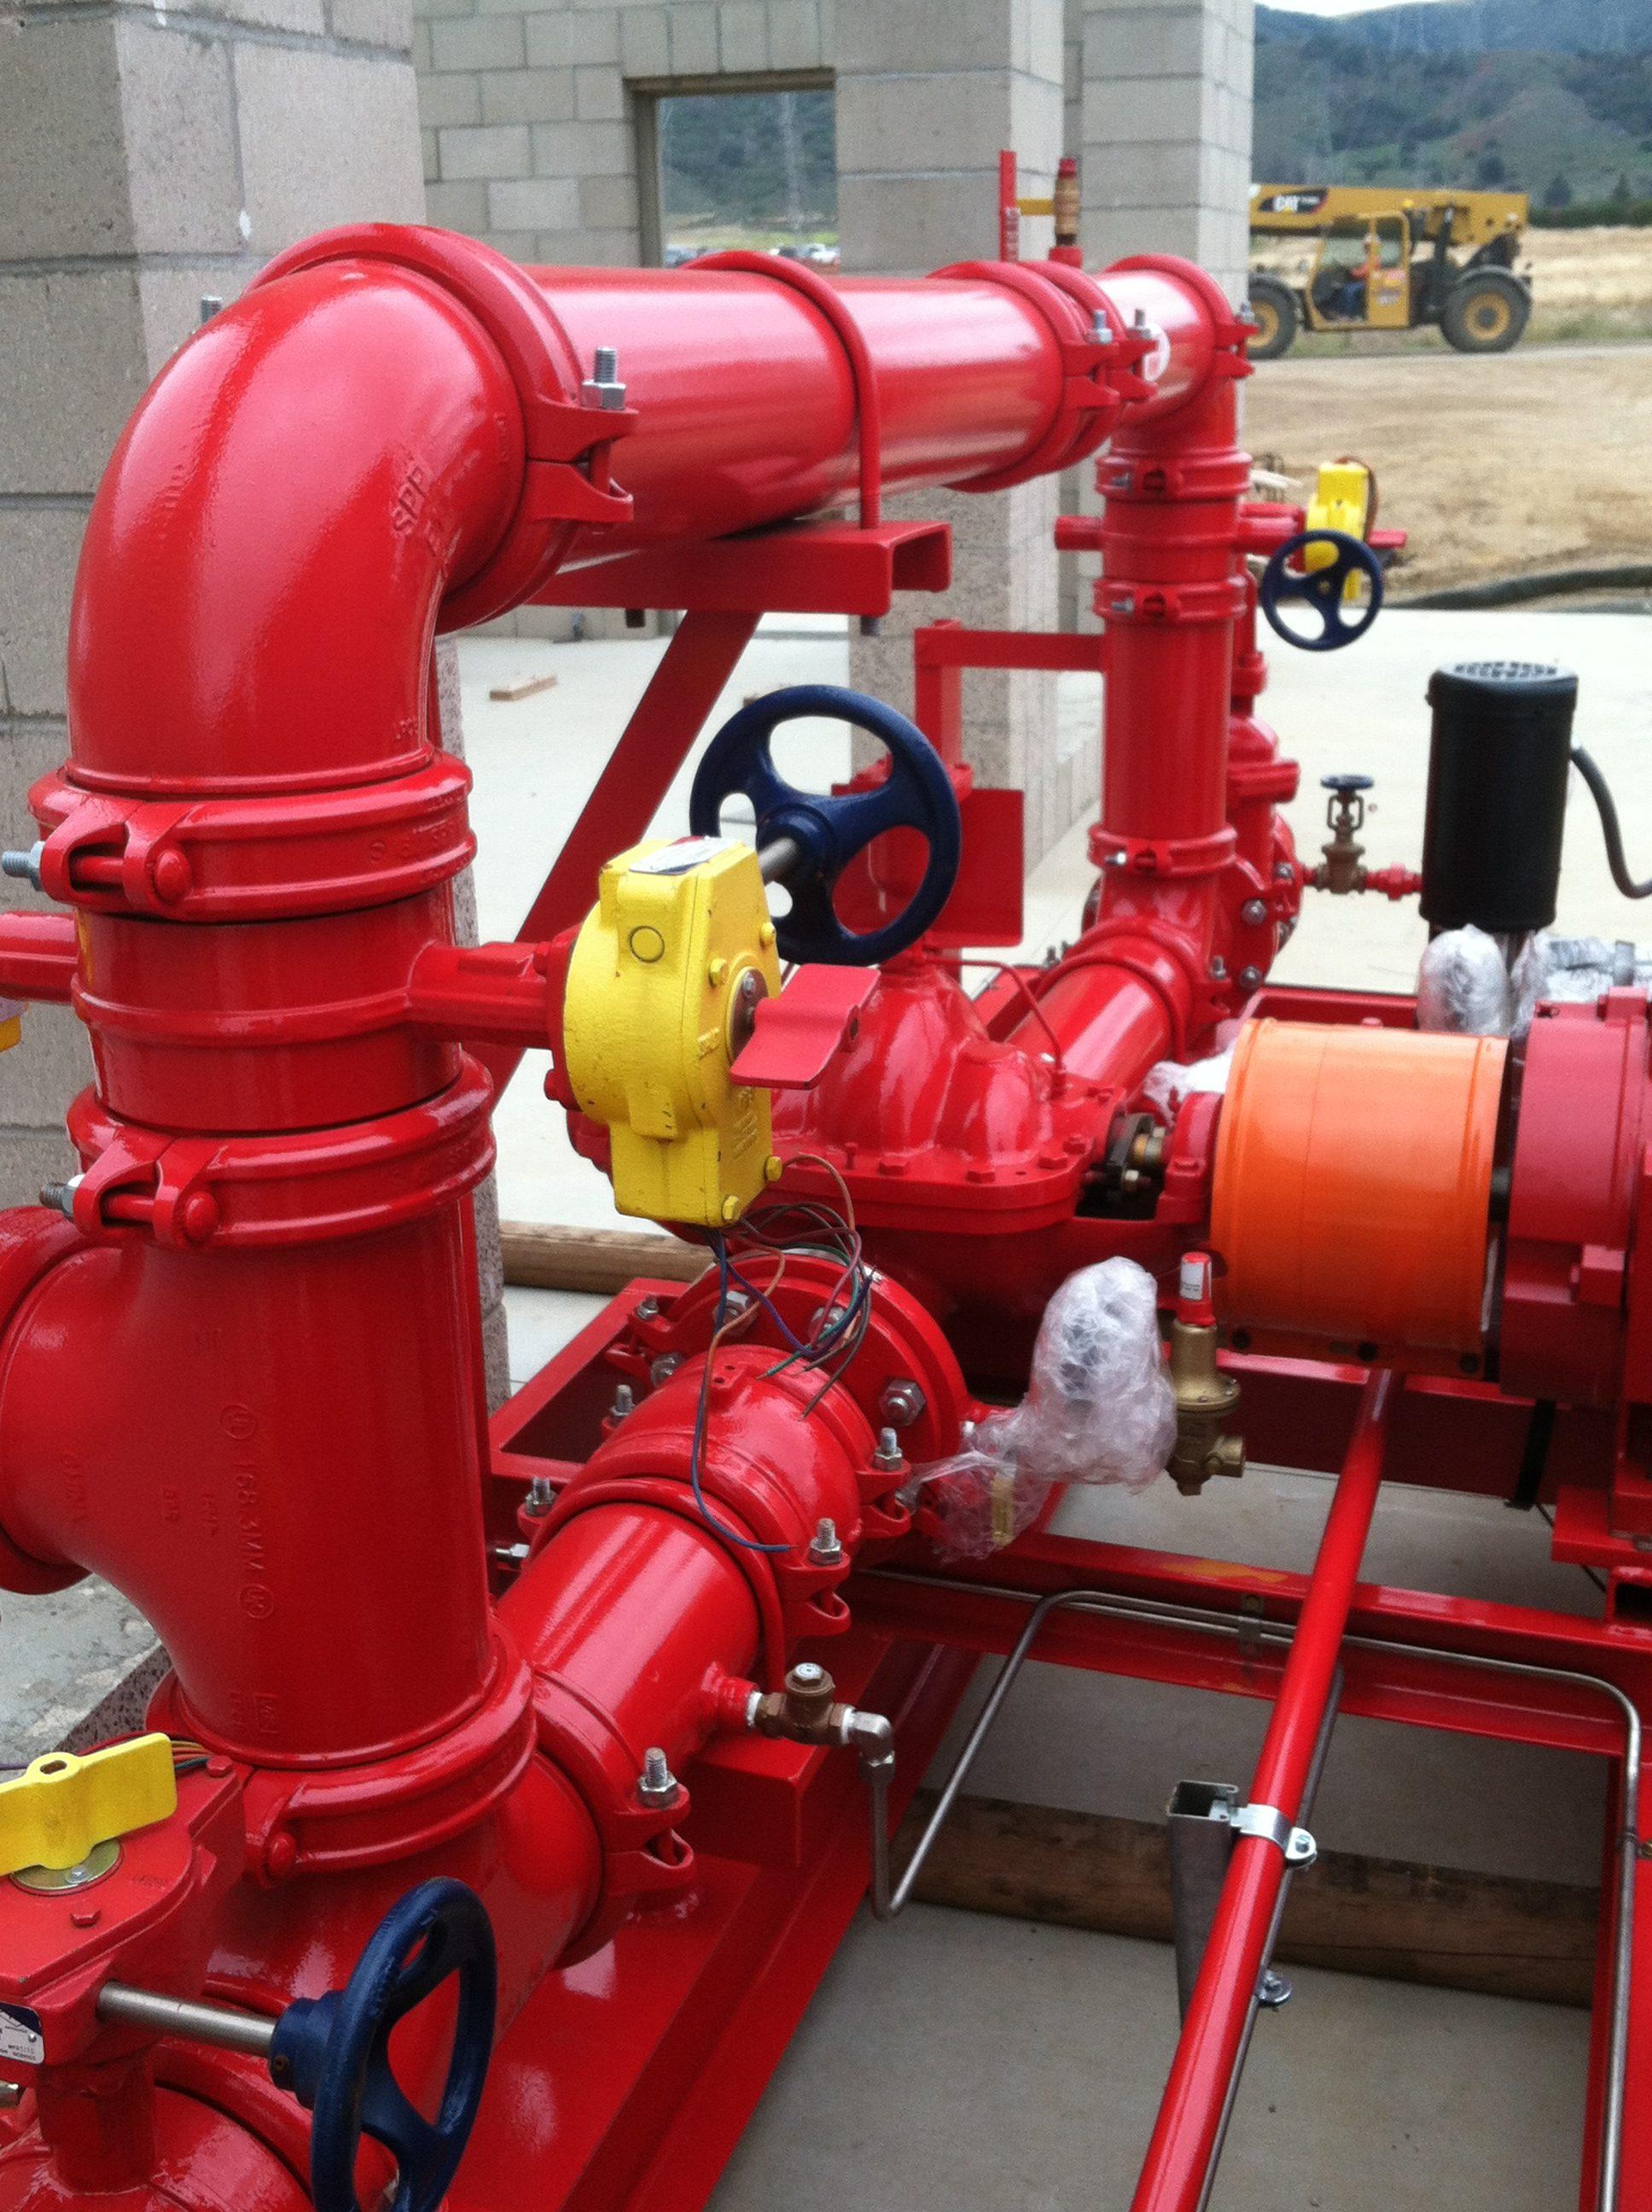 Fire Sprinkler Systems – Deep Blue Integration, Inc